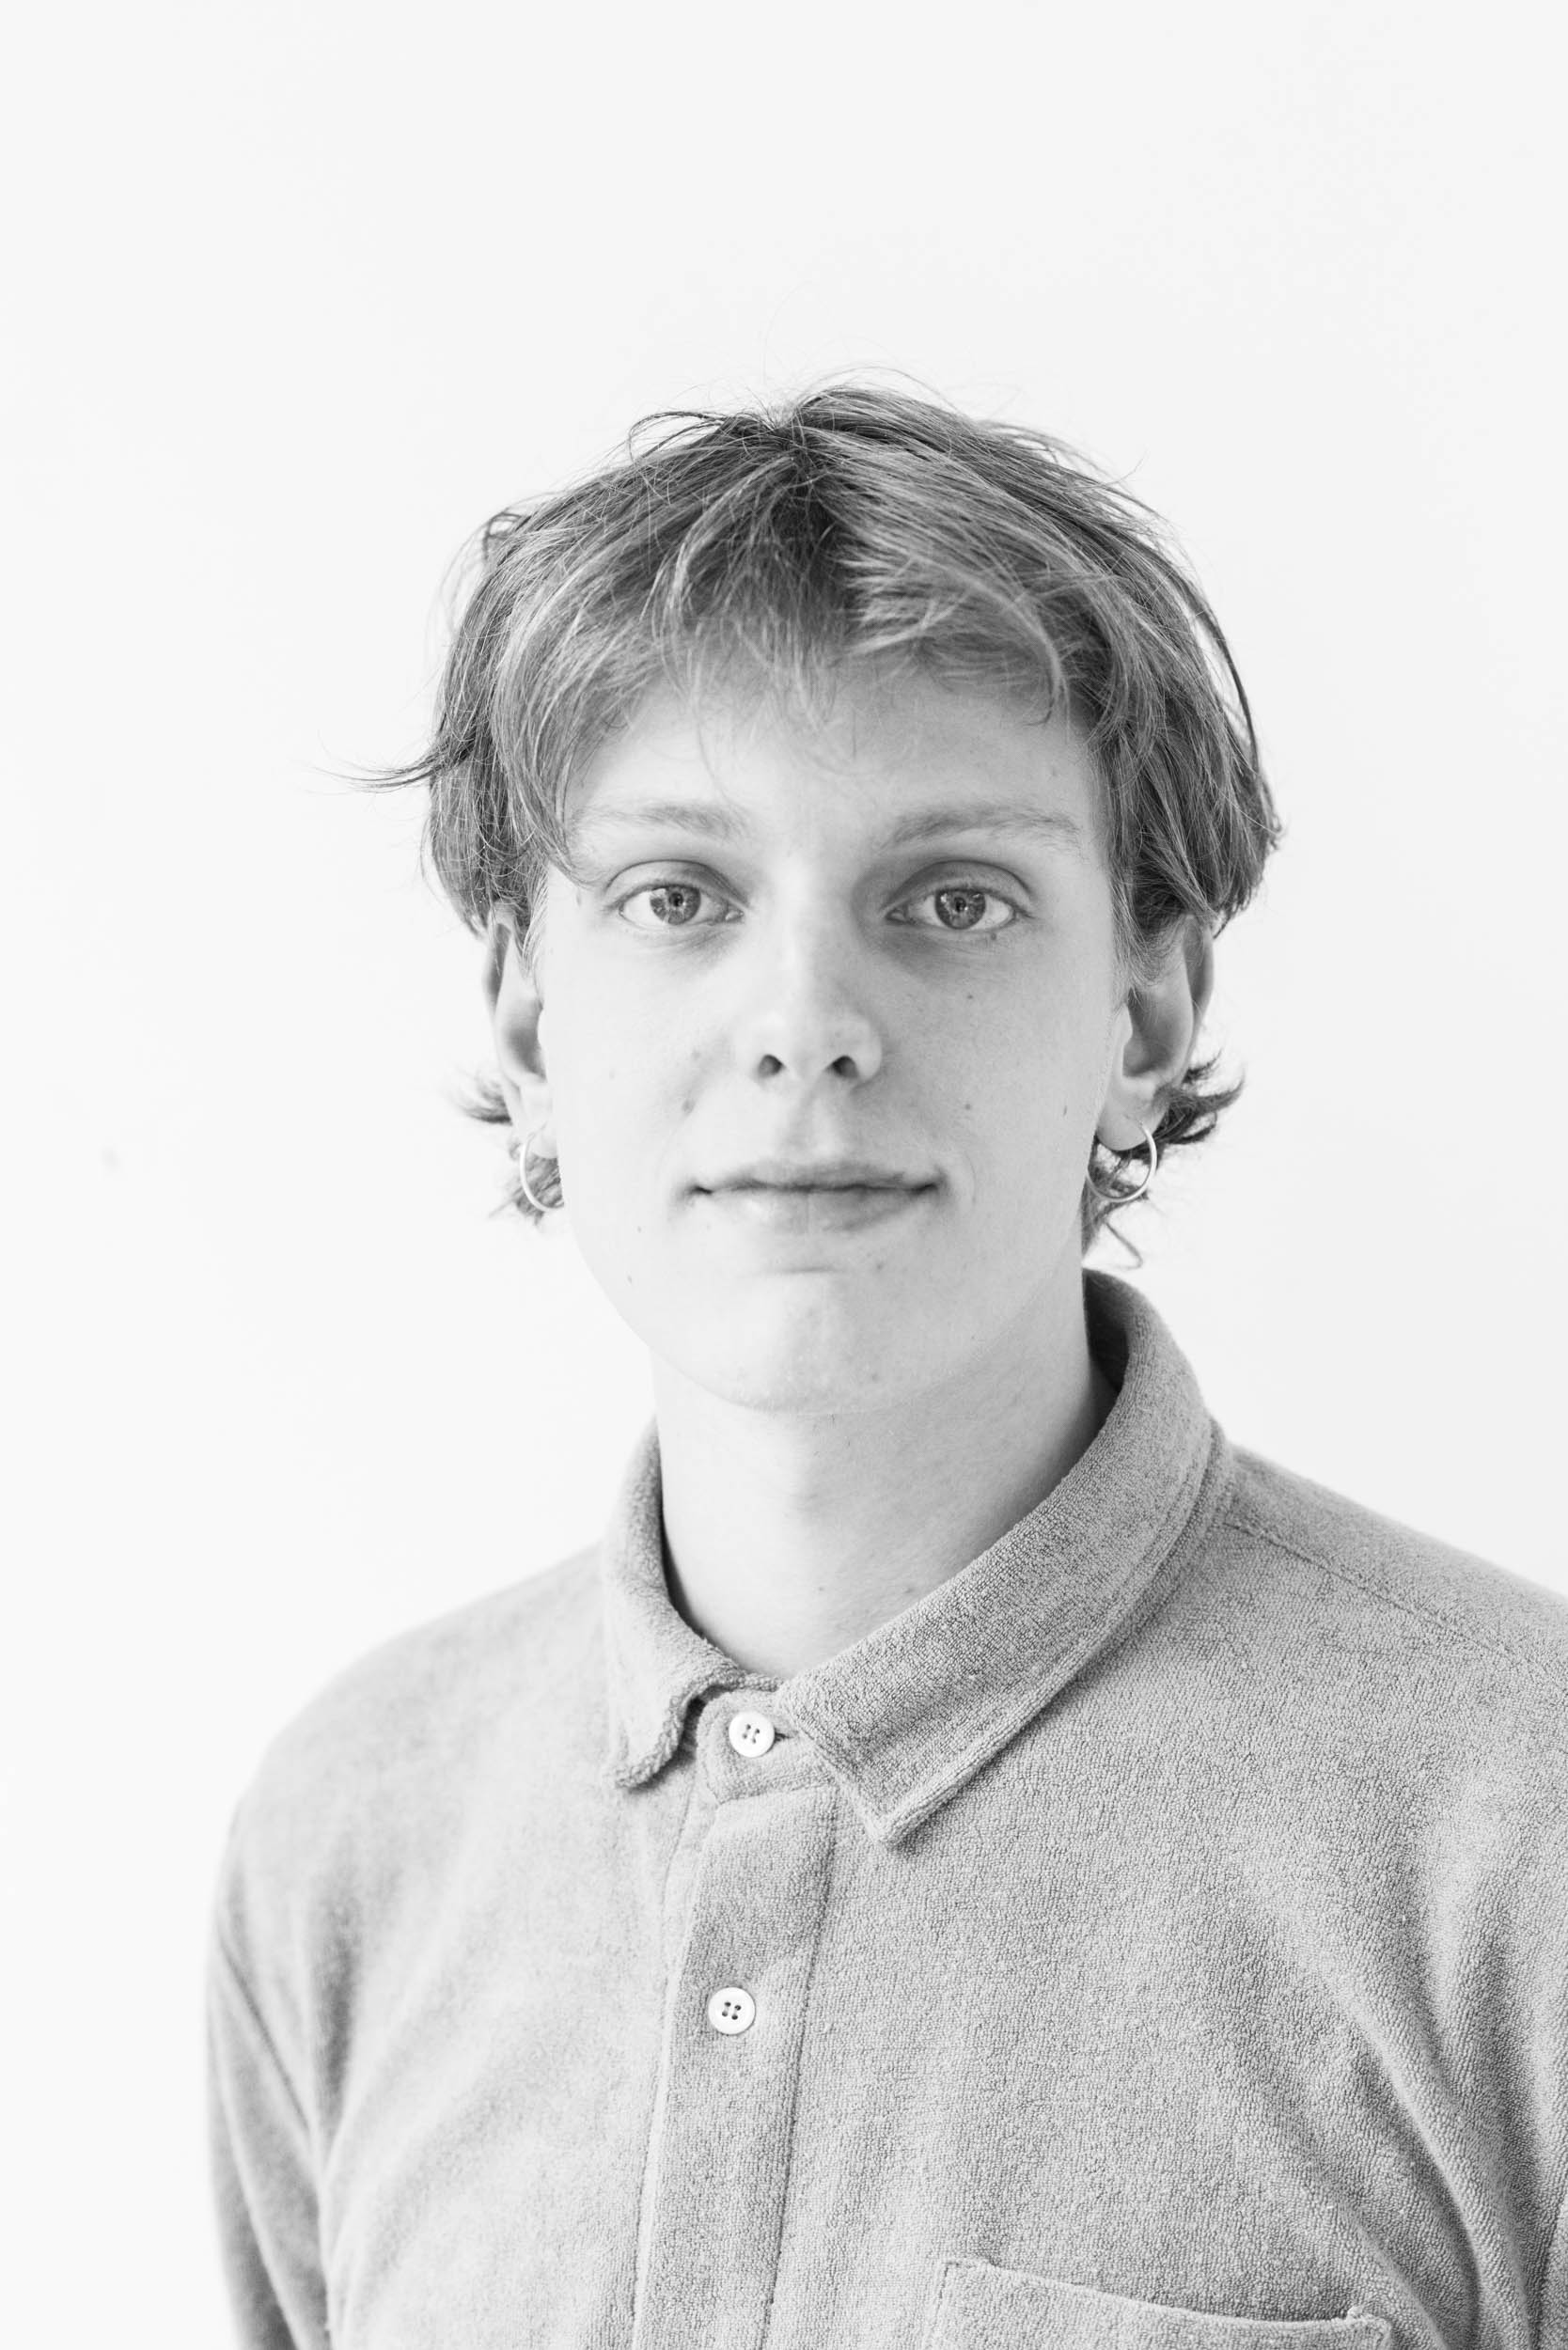 Matias Løkke Borg